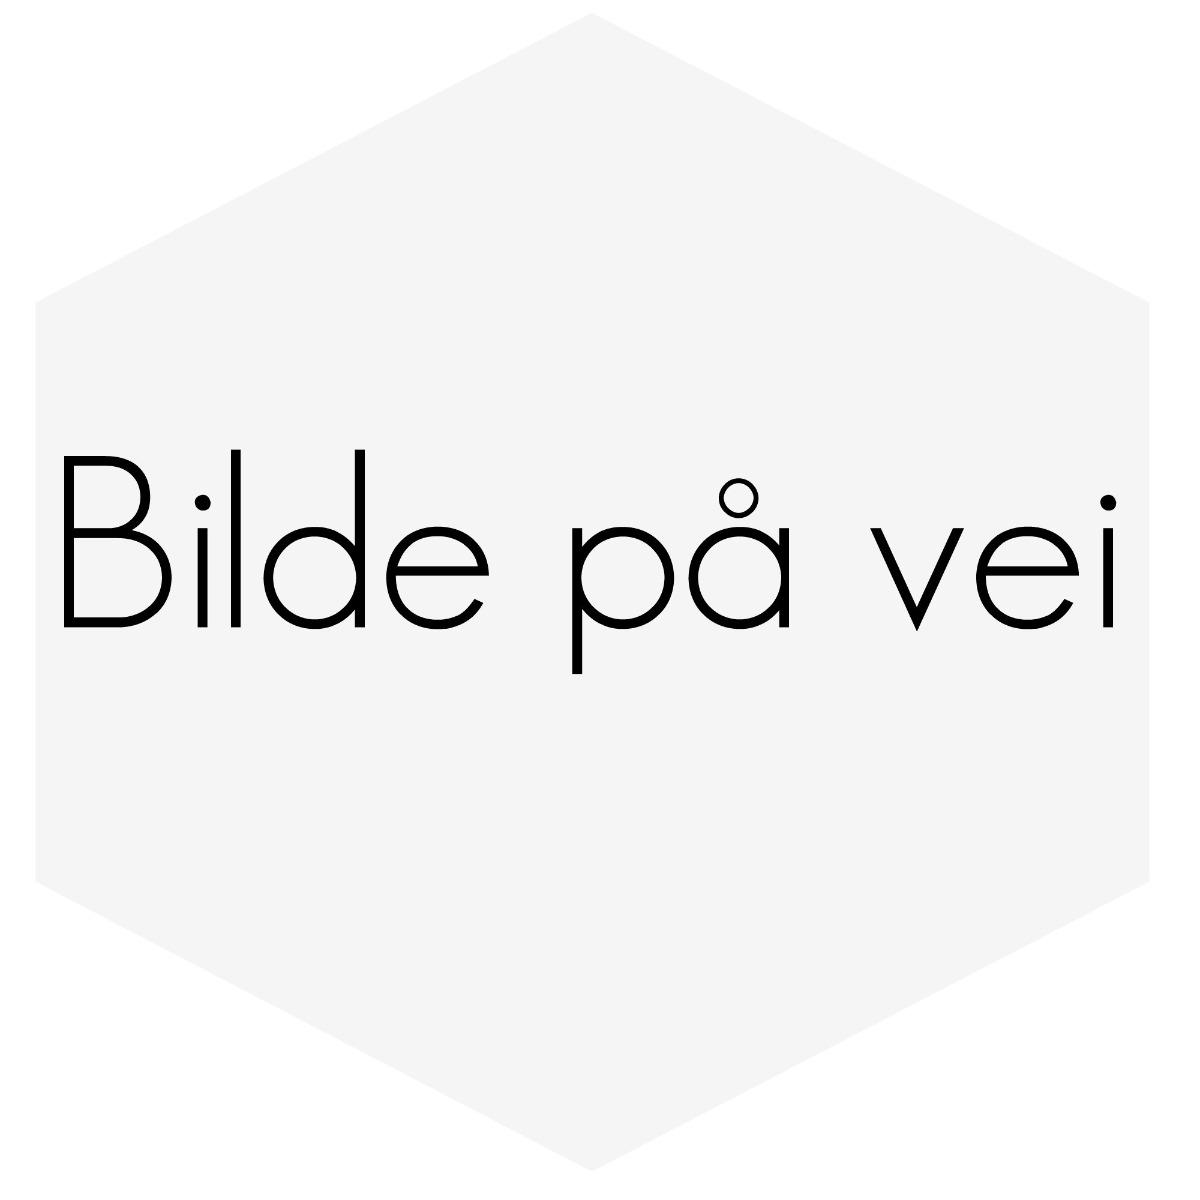 "SILIKONSLANGE DESIMETERVARE BLÅ 0,375"" (9,5MM)"